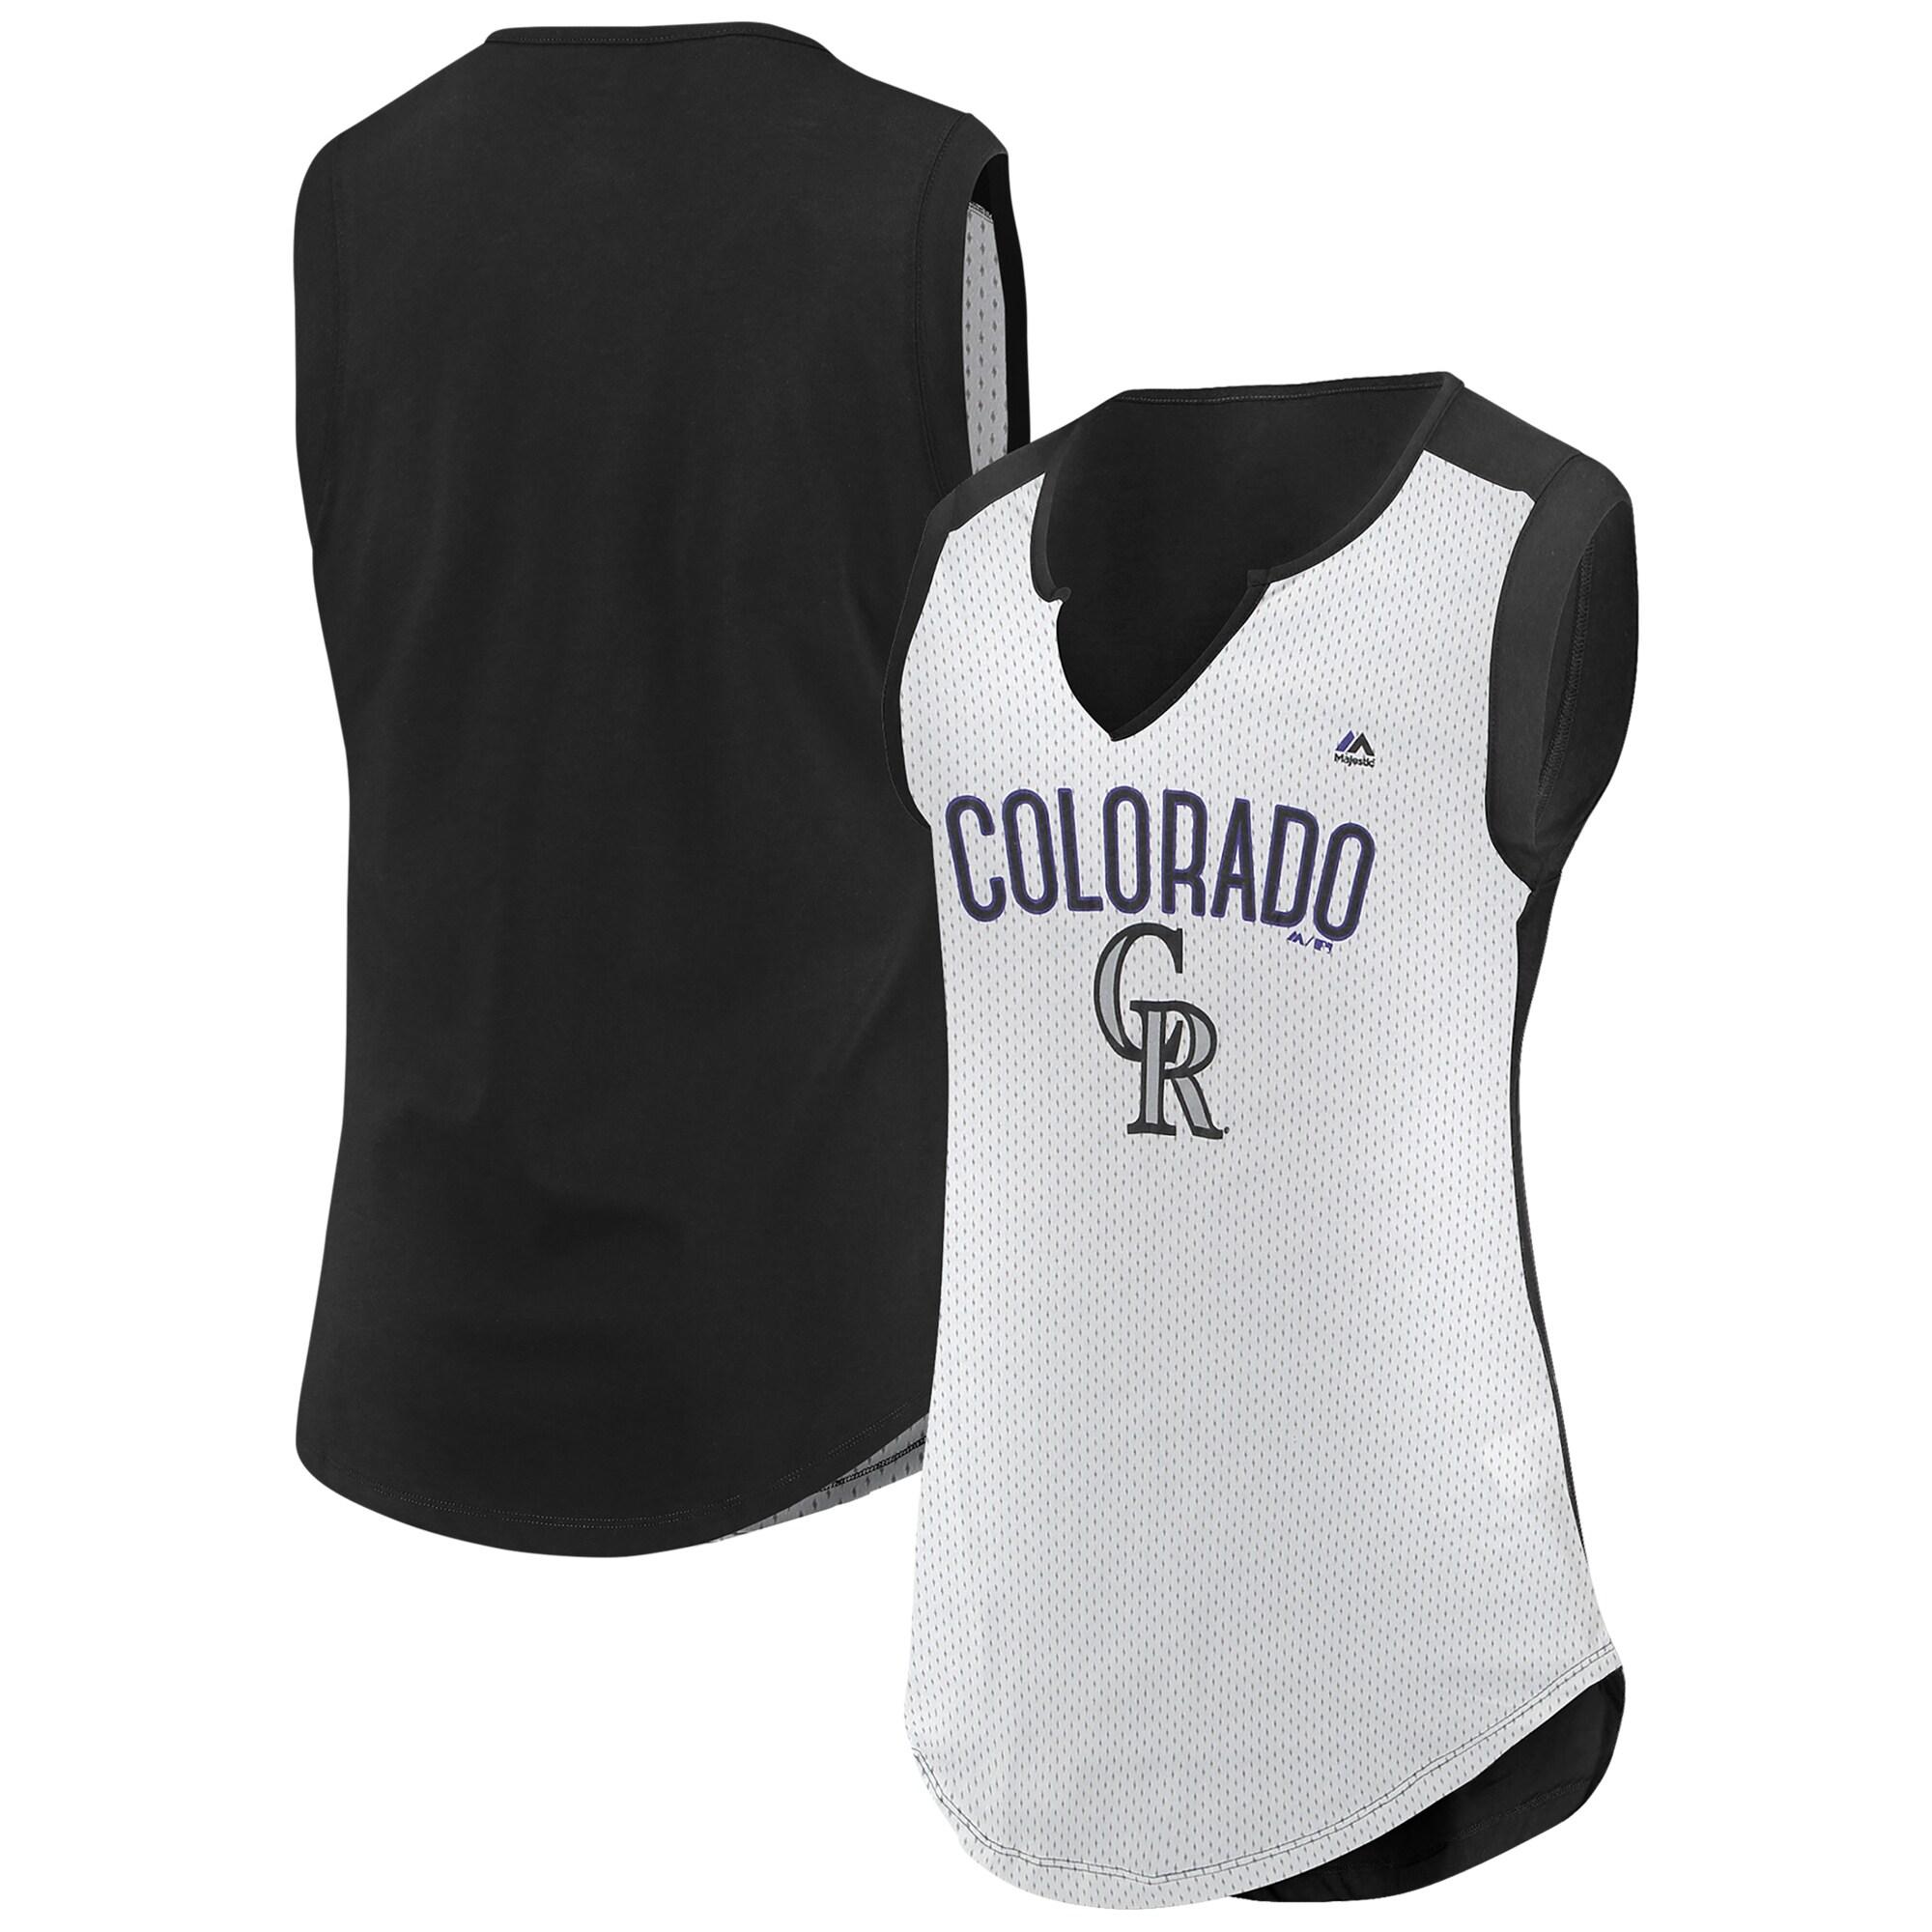 Colorado Rockies Majestic Women's Decisive Battle Muscle T-Shirt - White